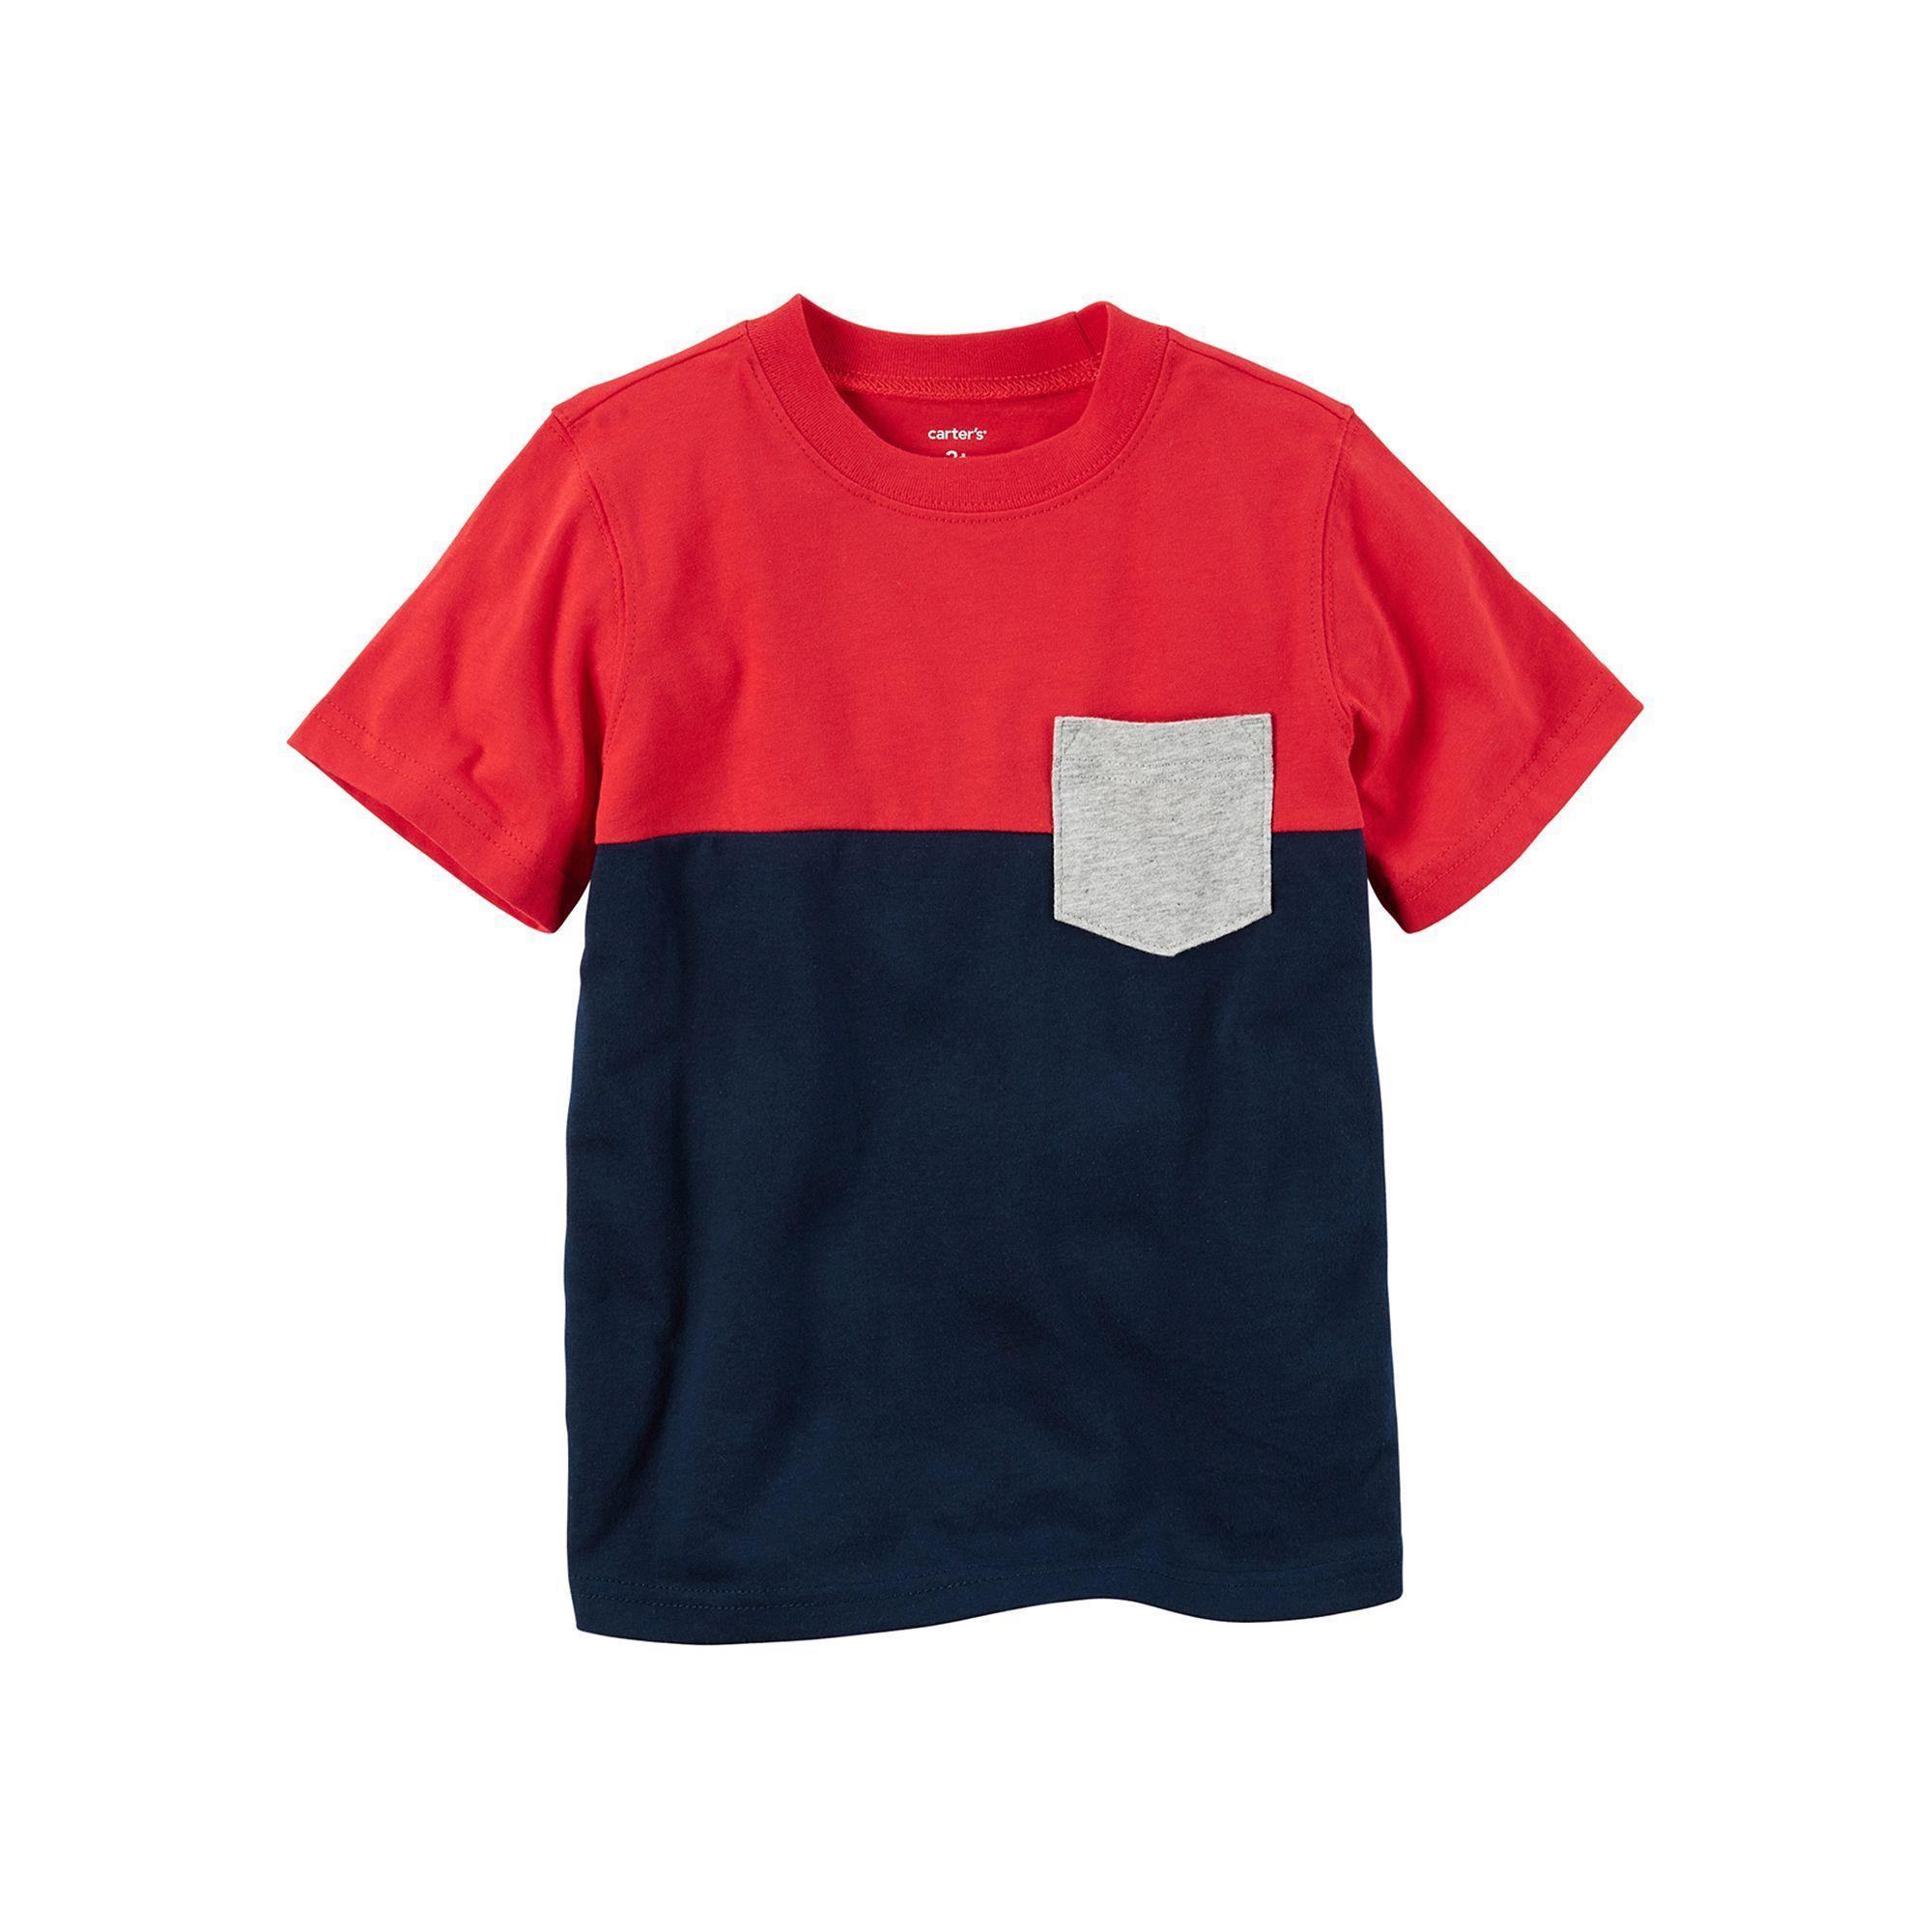 Carter s Baby Boy Short Sleeve Red & Navy Colorblock Pocket Tee